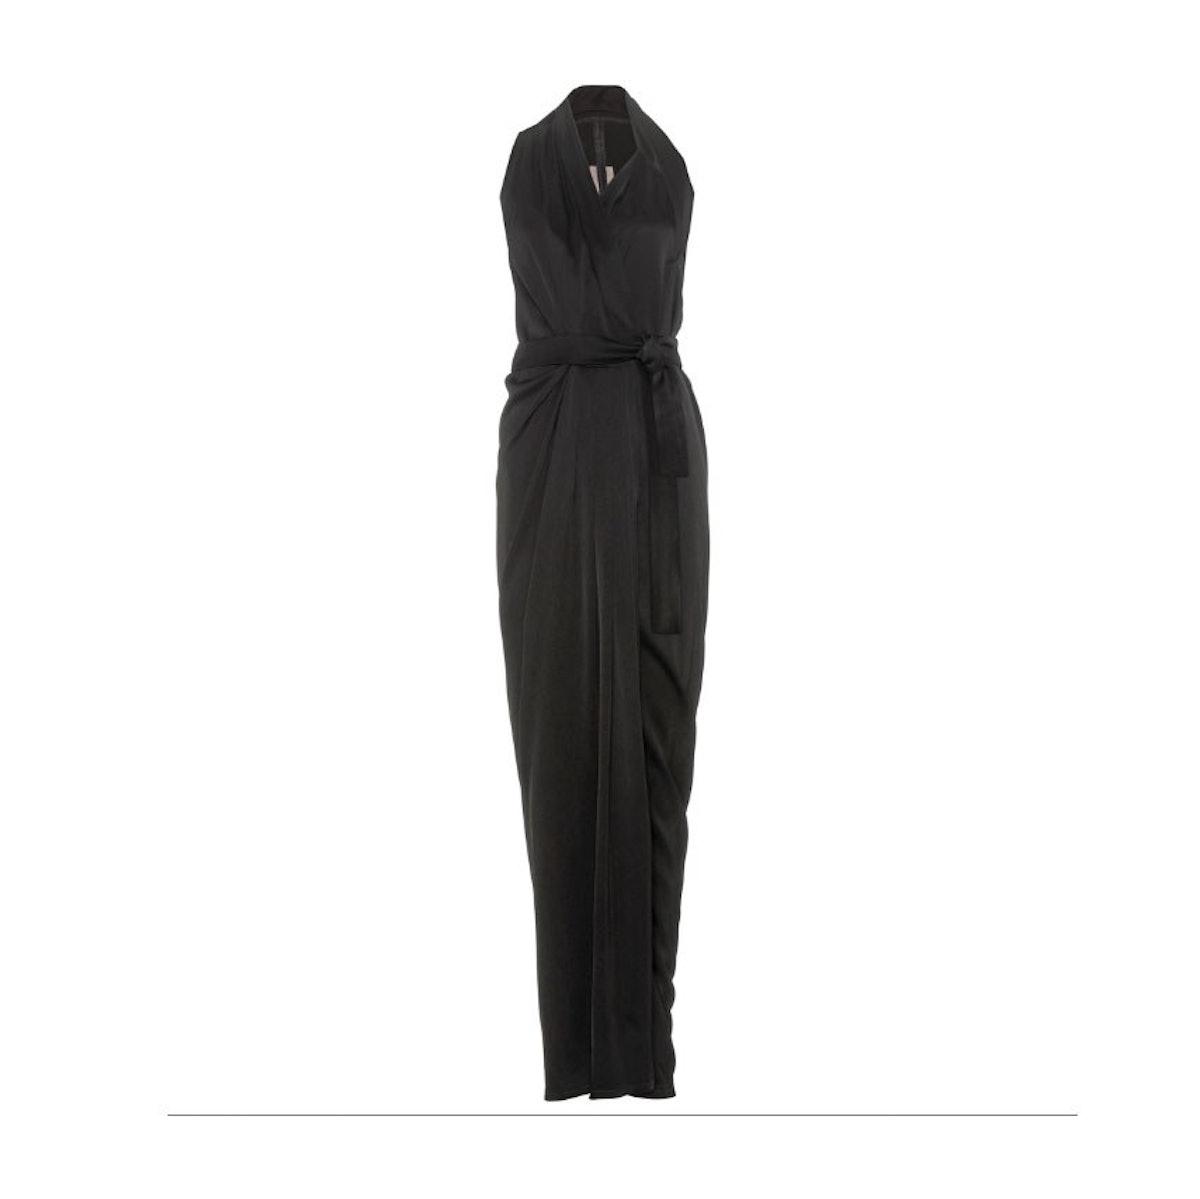 Rick-Owens-dress-1018-mytheresa.com_.jpg